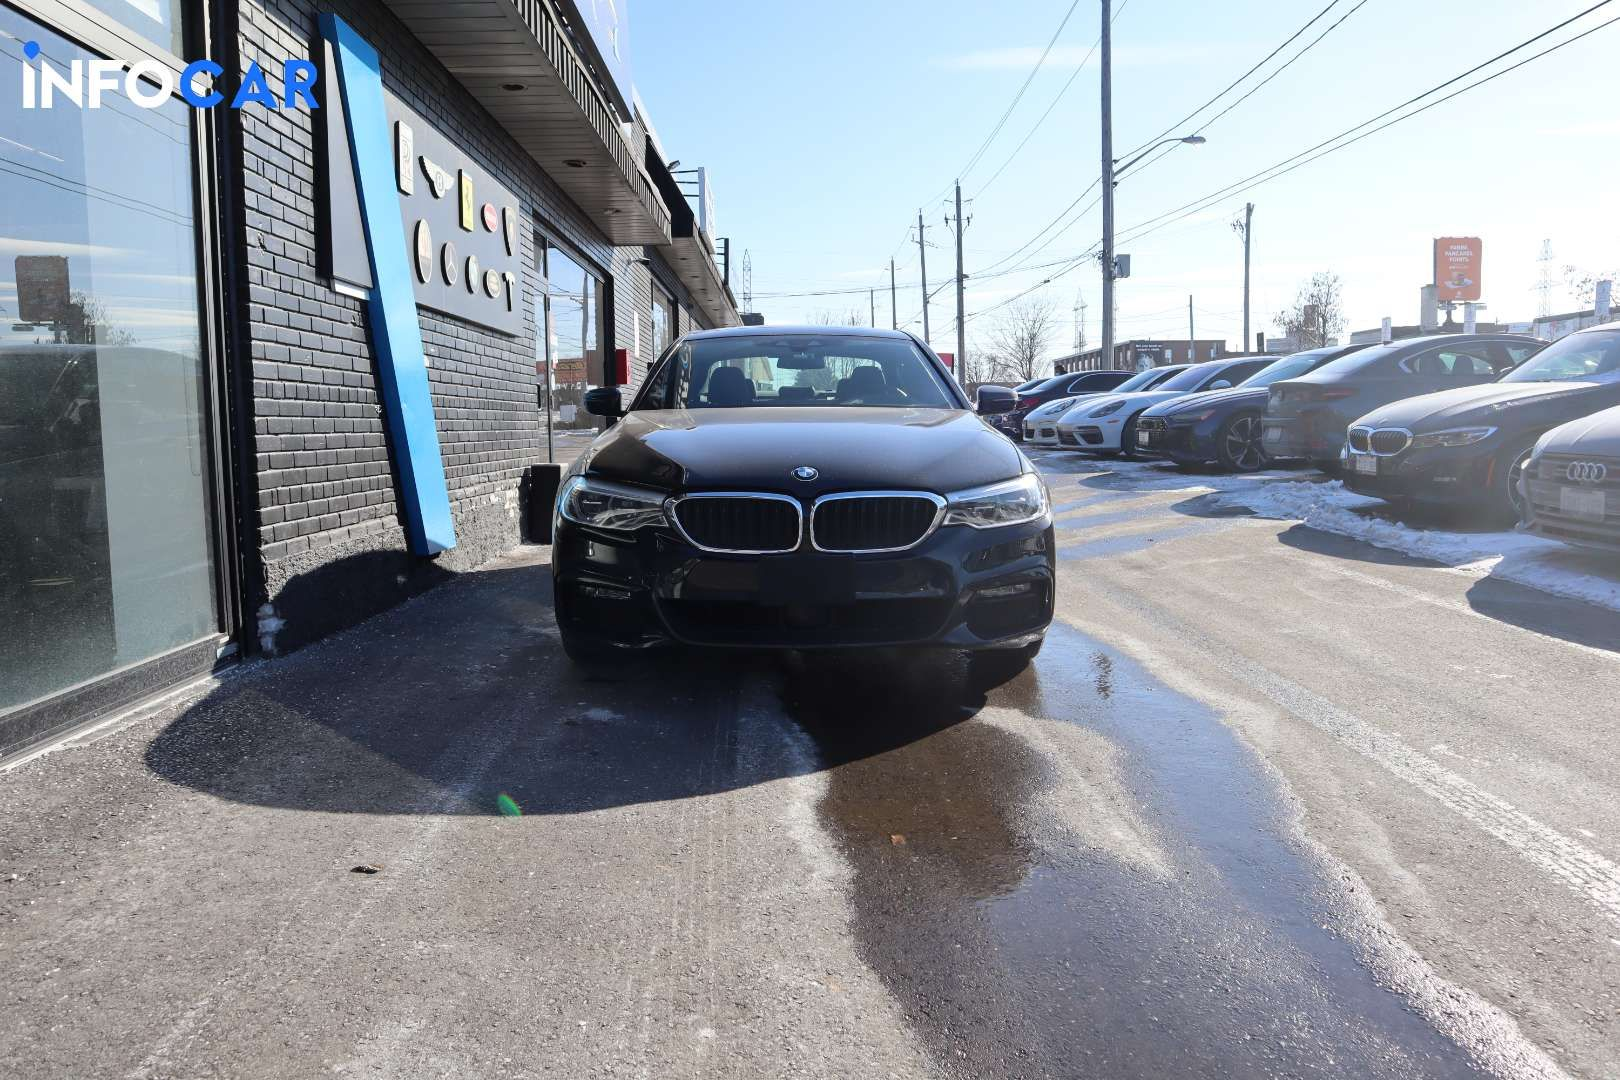 2019 BMW 5-Series 530i xDrive - INFOCAR - Toronto's Most Comprehensive New and Used Auto Trading Platform